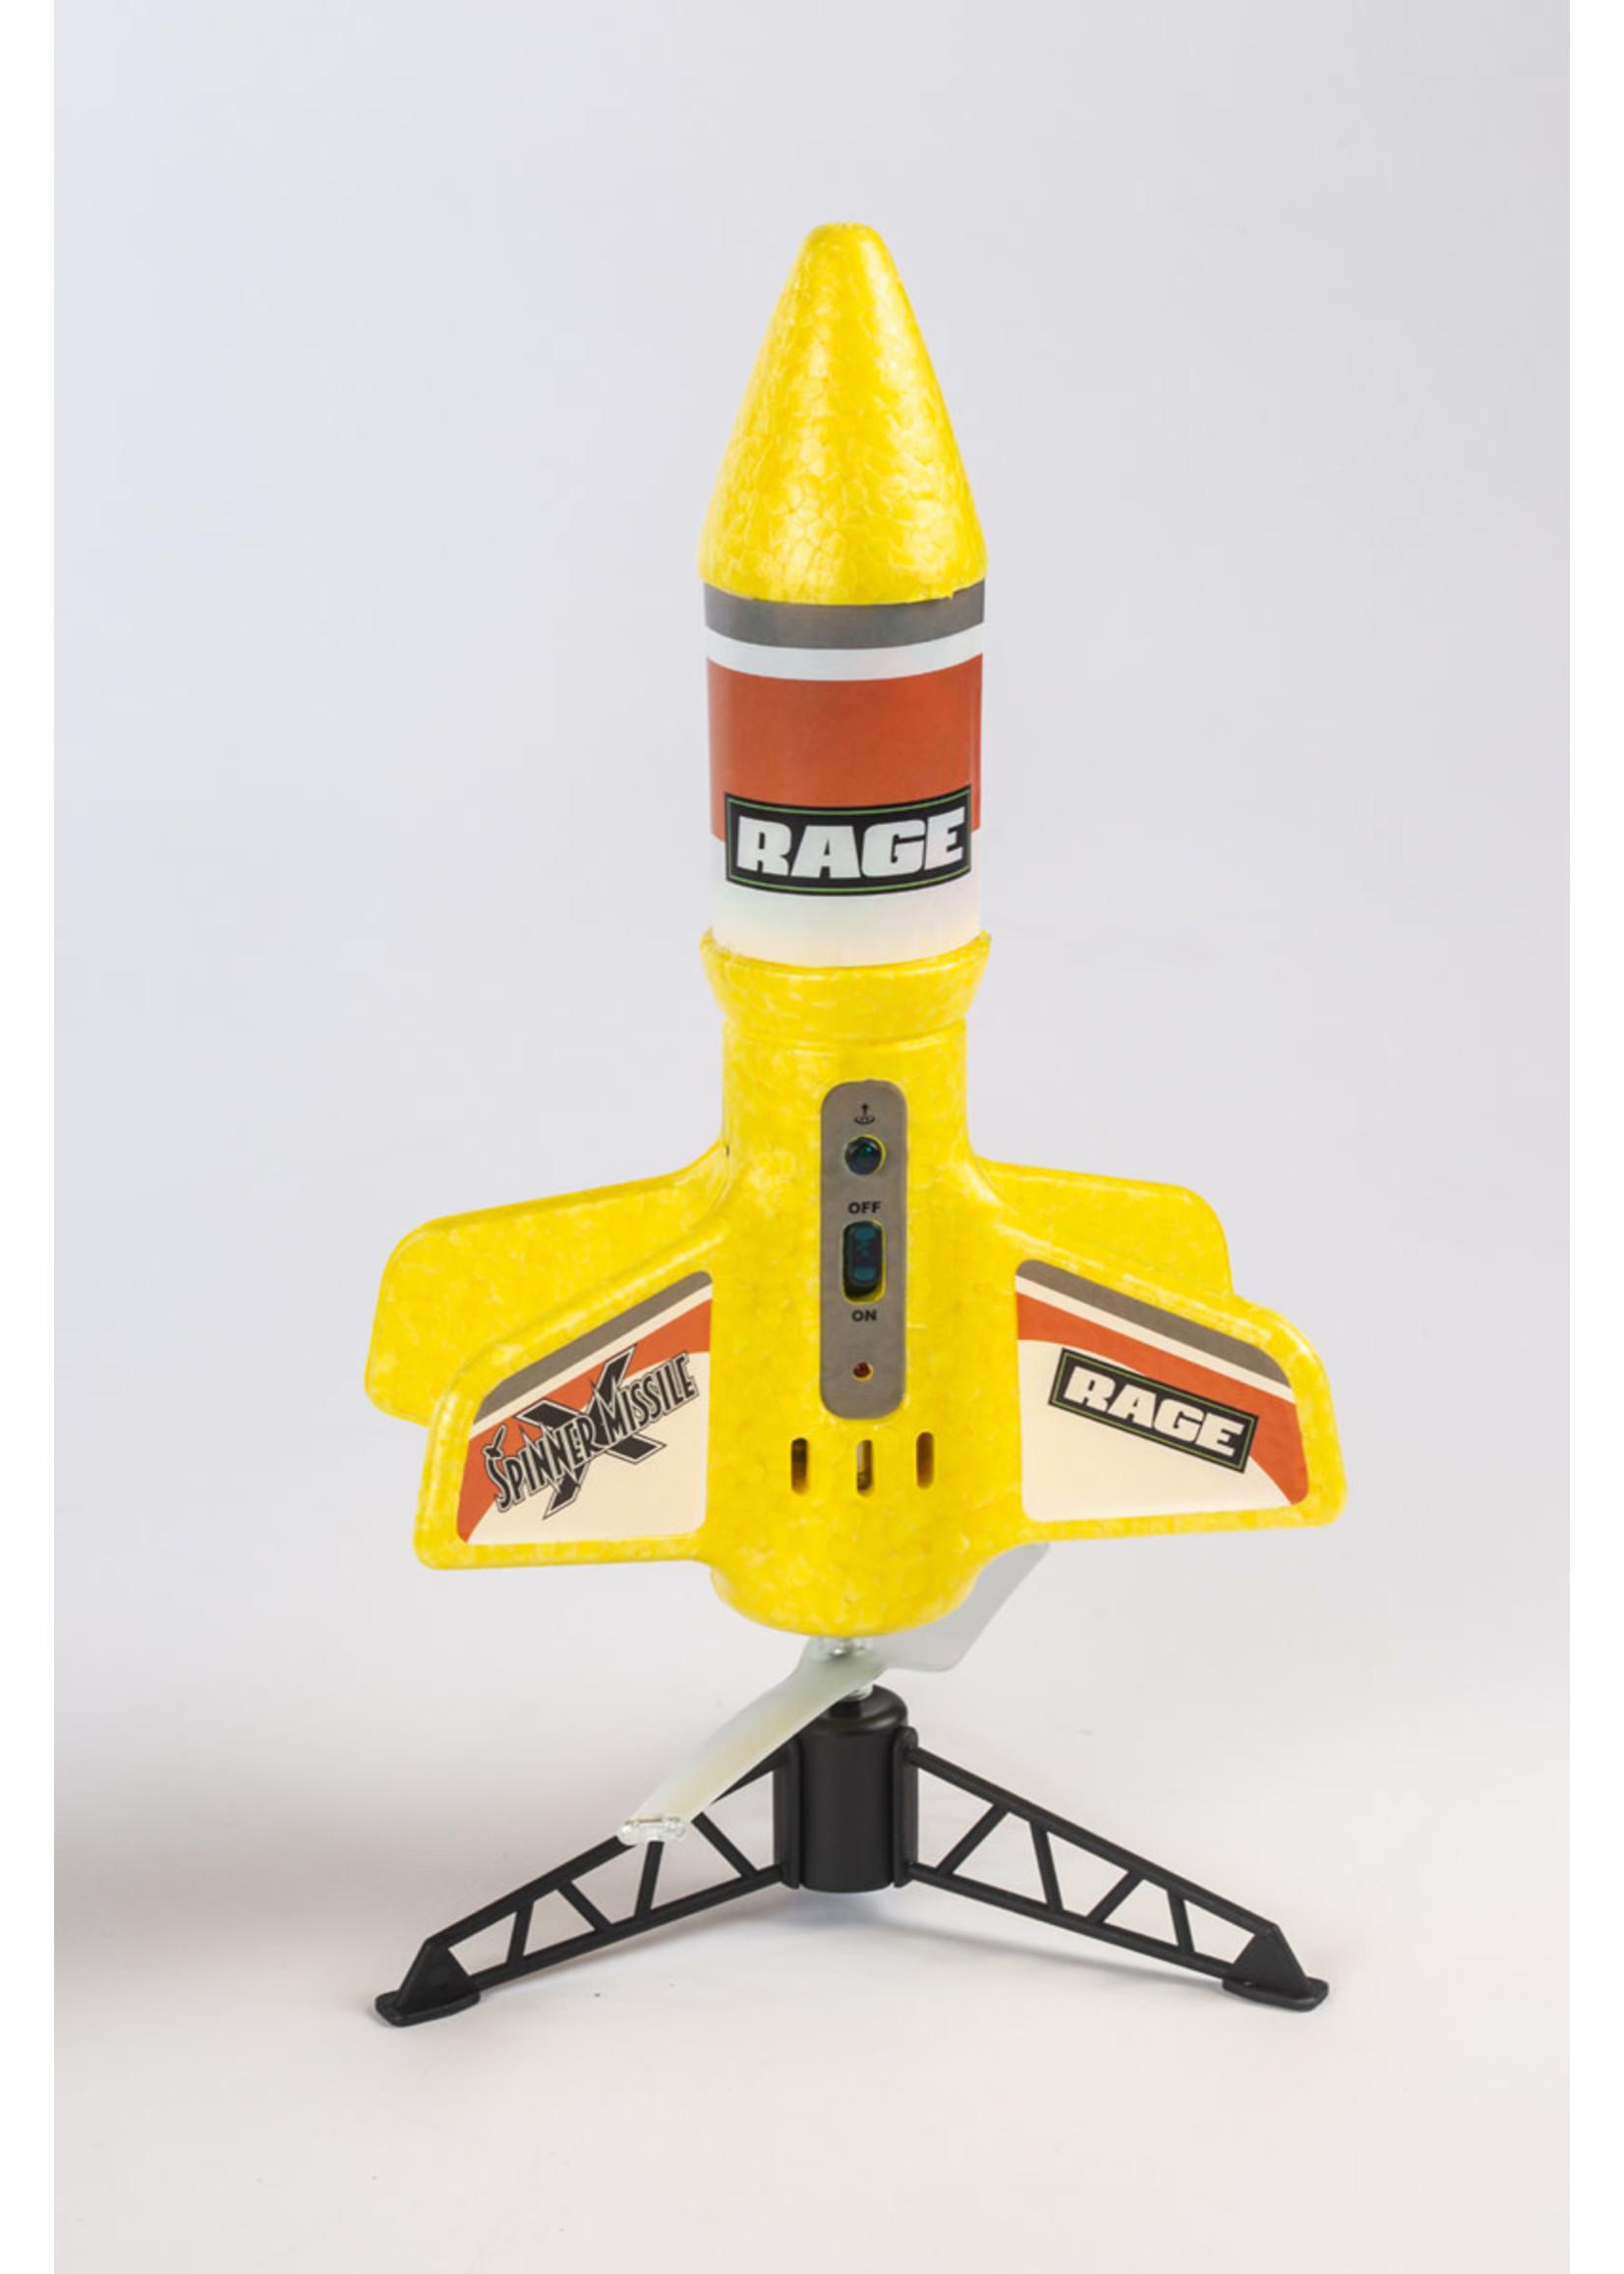 Rage RC RGR4131Y Rage Spinner Missile X Electric Free-Flight Rocket Yellow